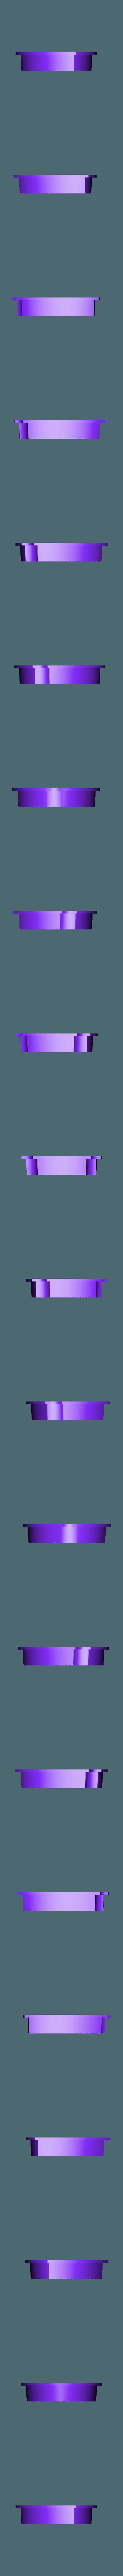 Rouge fond logo.STL Download STL file Patrol Punch (Paw Patrol) • 3D print object, Chris-tropherIlParait